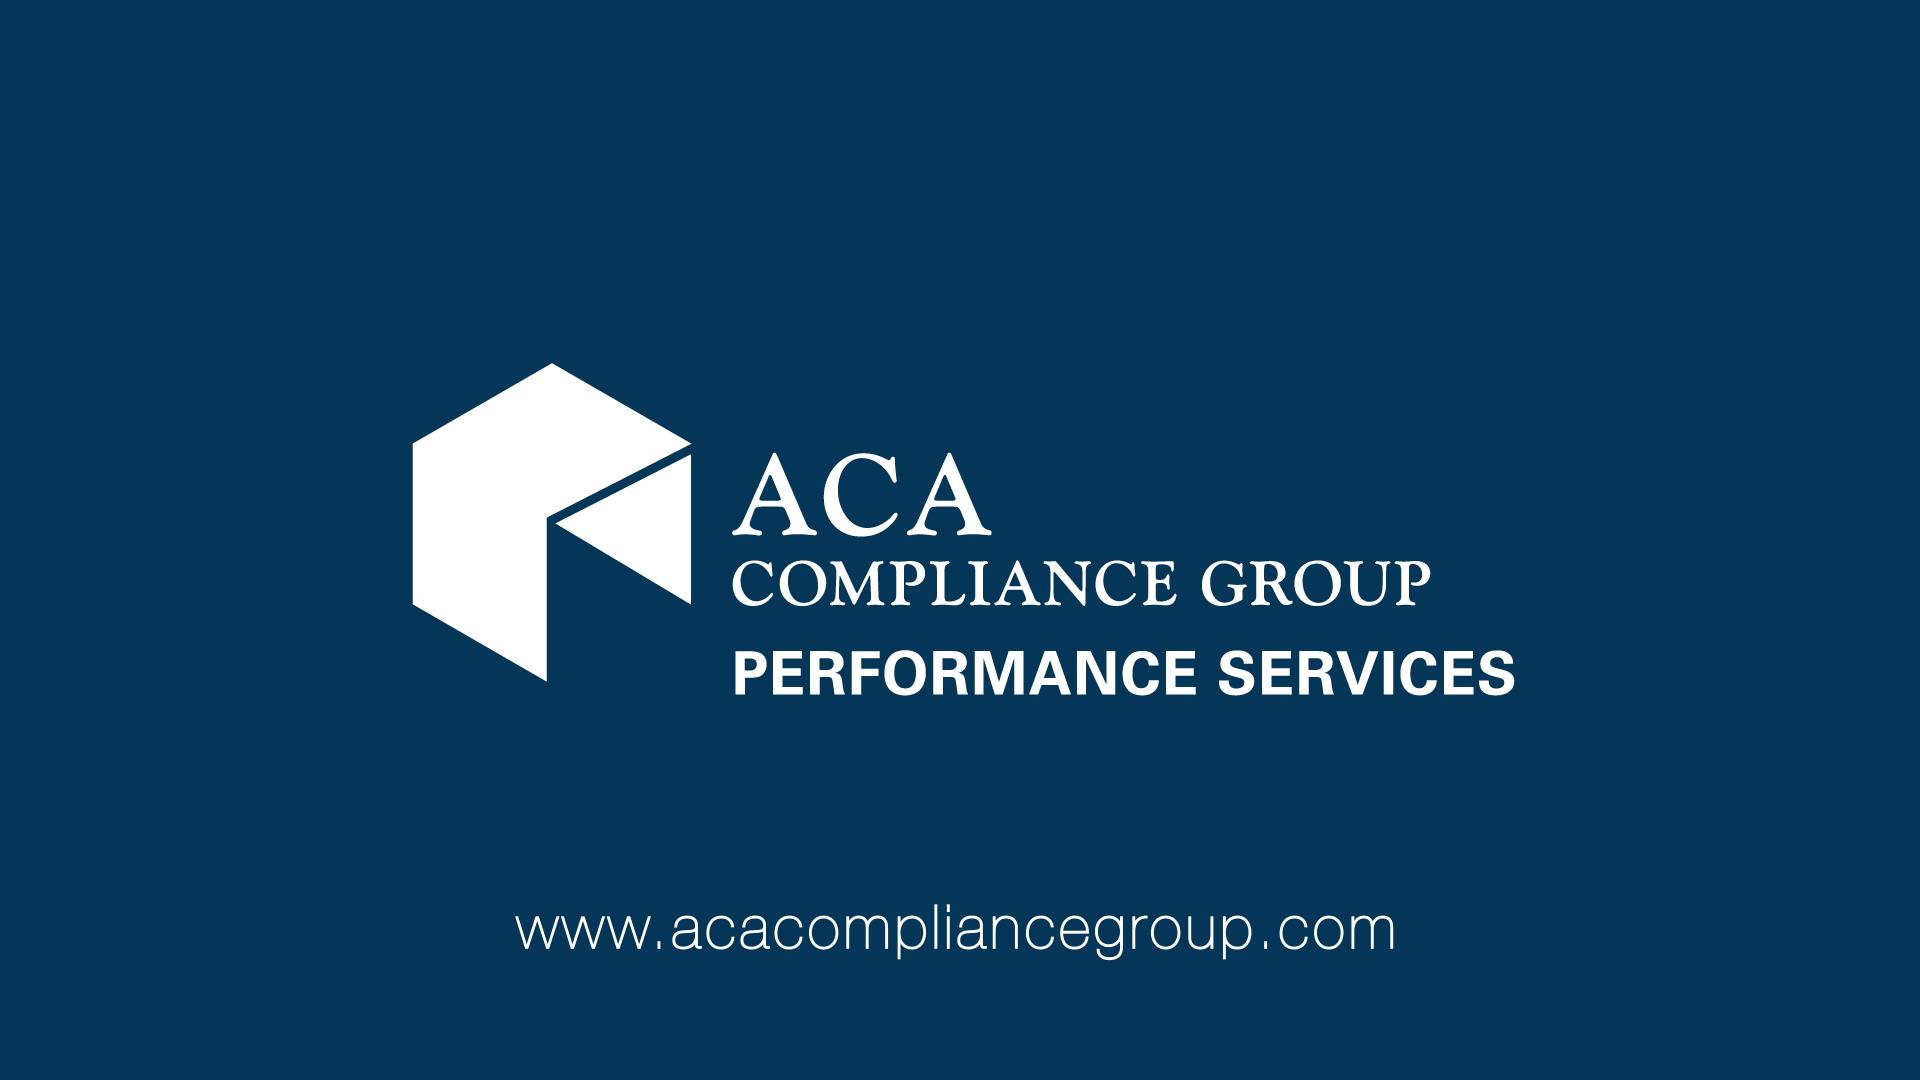 ACA Compliance Group_ACA Performance Hype Video